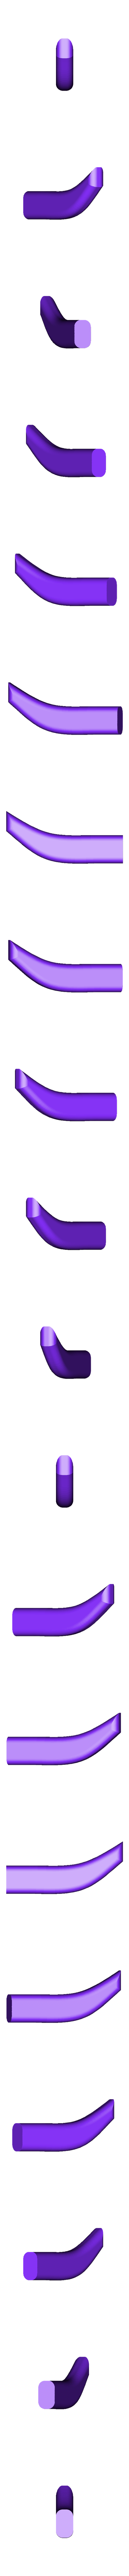 Trigger.stl Télécharger fichier STL gratuit Borderlands Bandit Room Clener Shotgun • Modèle pour impression 3D, Dsk